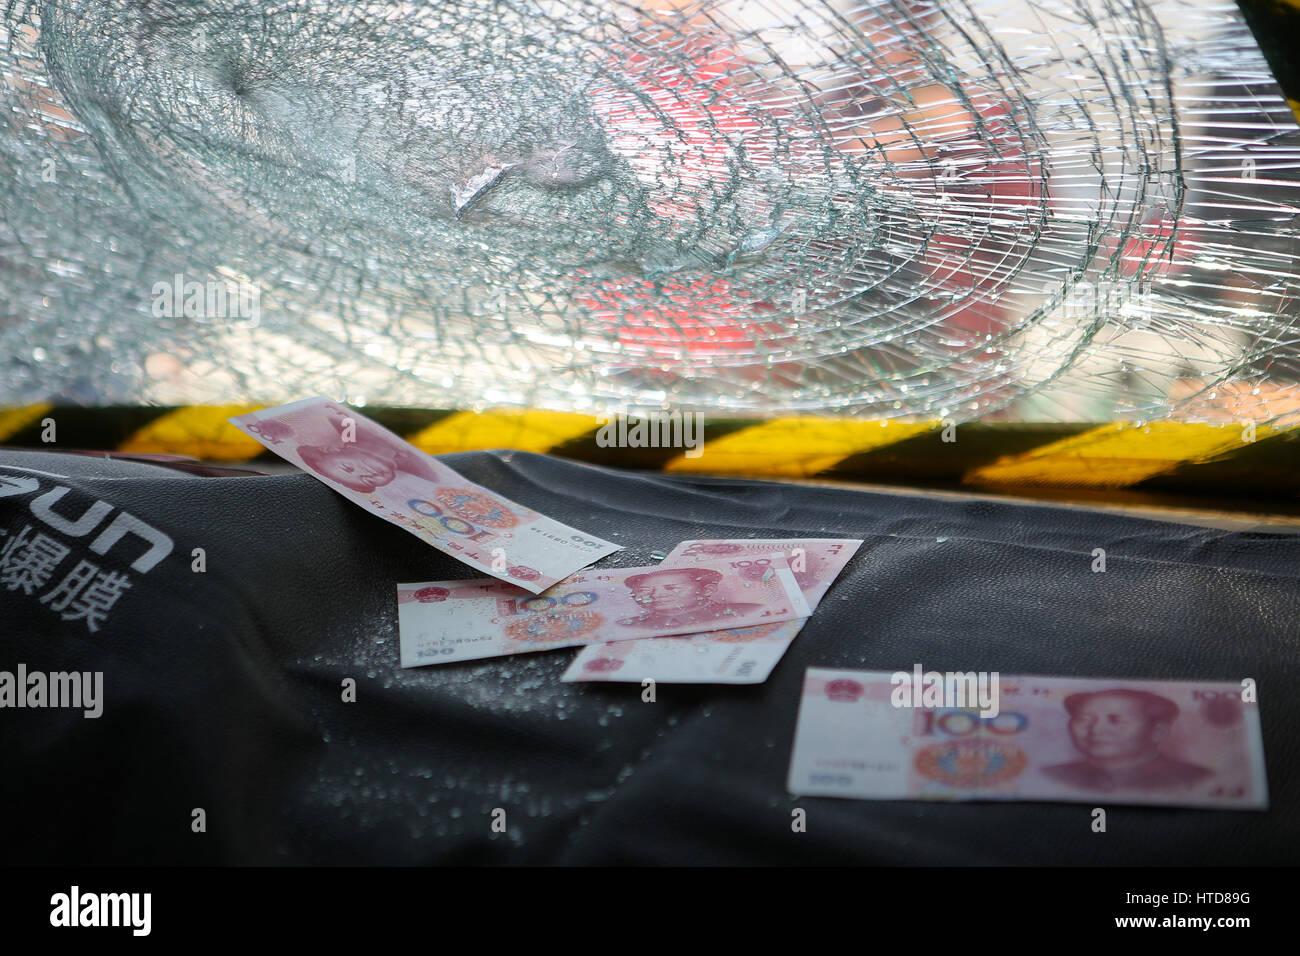 Auto Breaks Stockfotos & Auto Breaks Bilder - Alamy